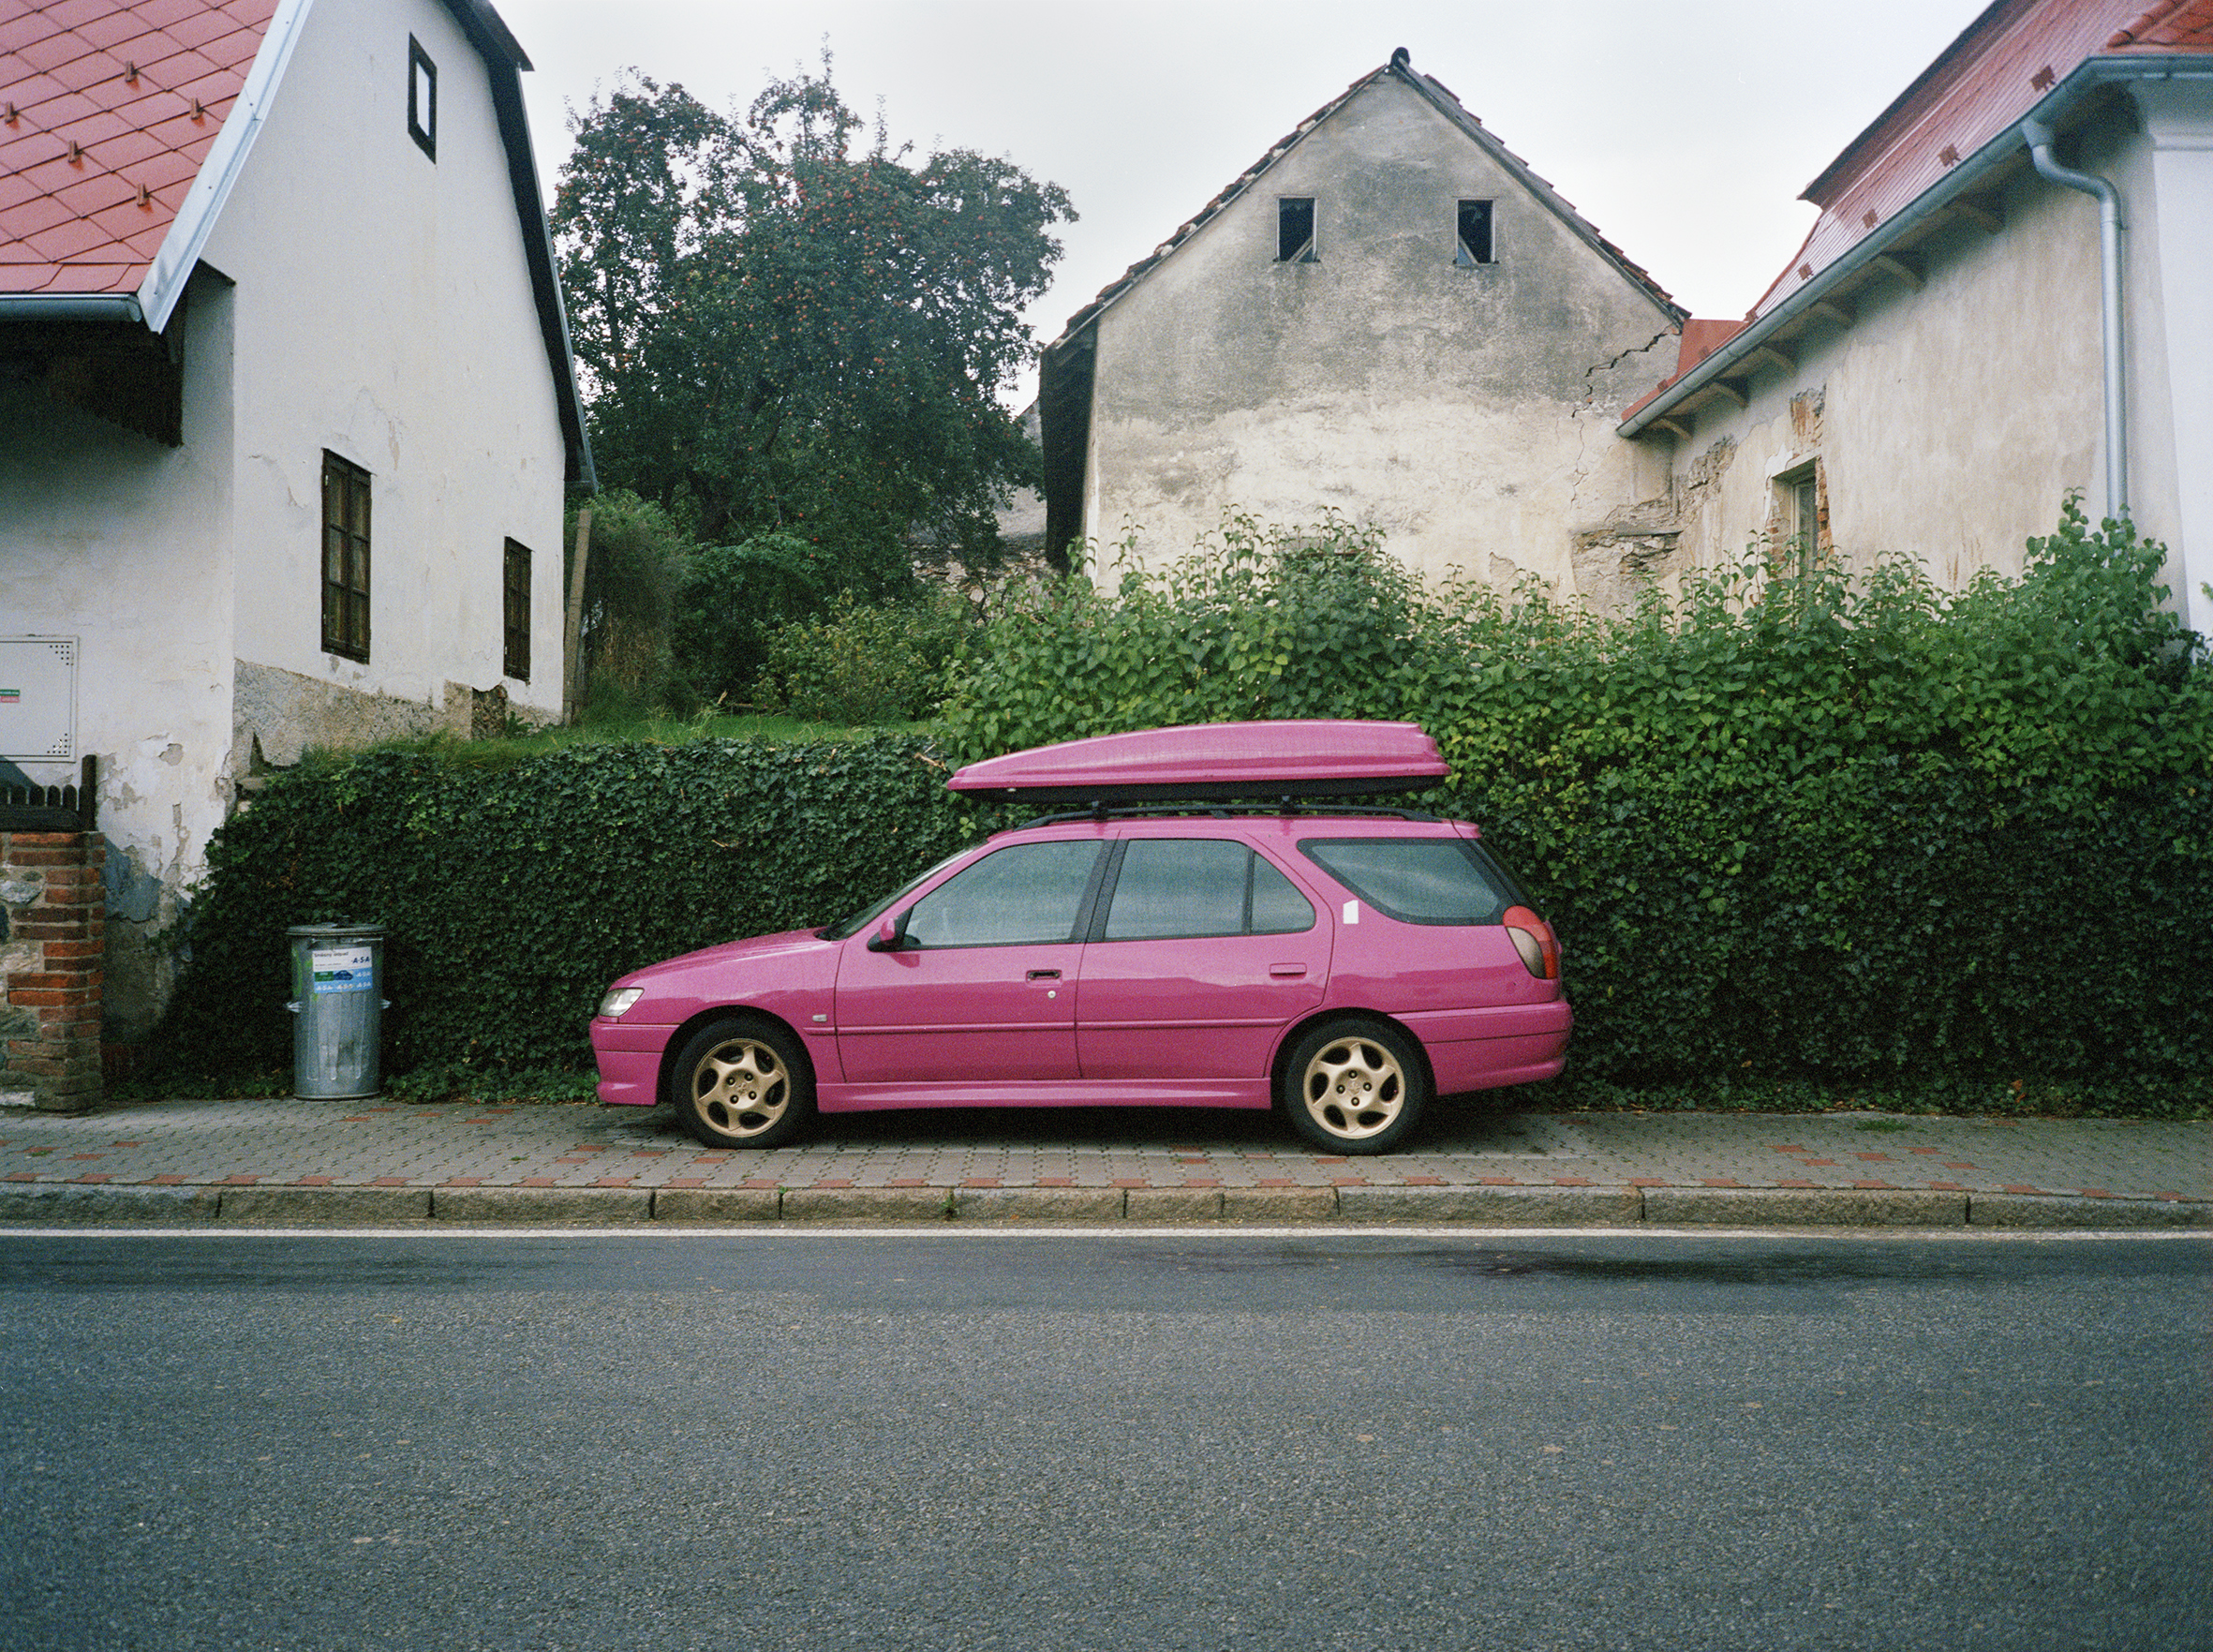 Czech_Pink_Car.jpg